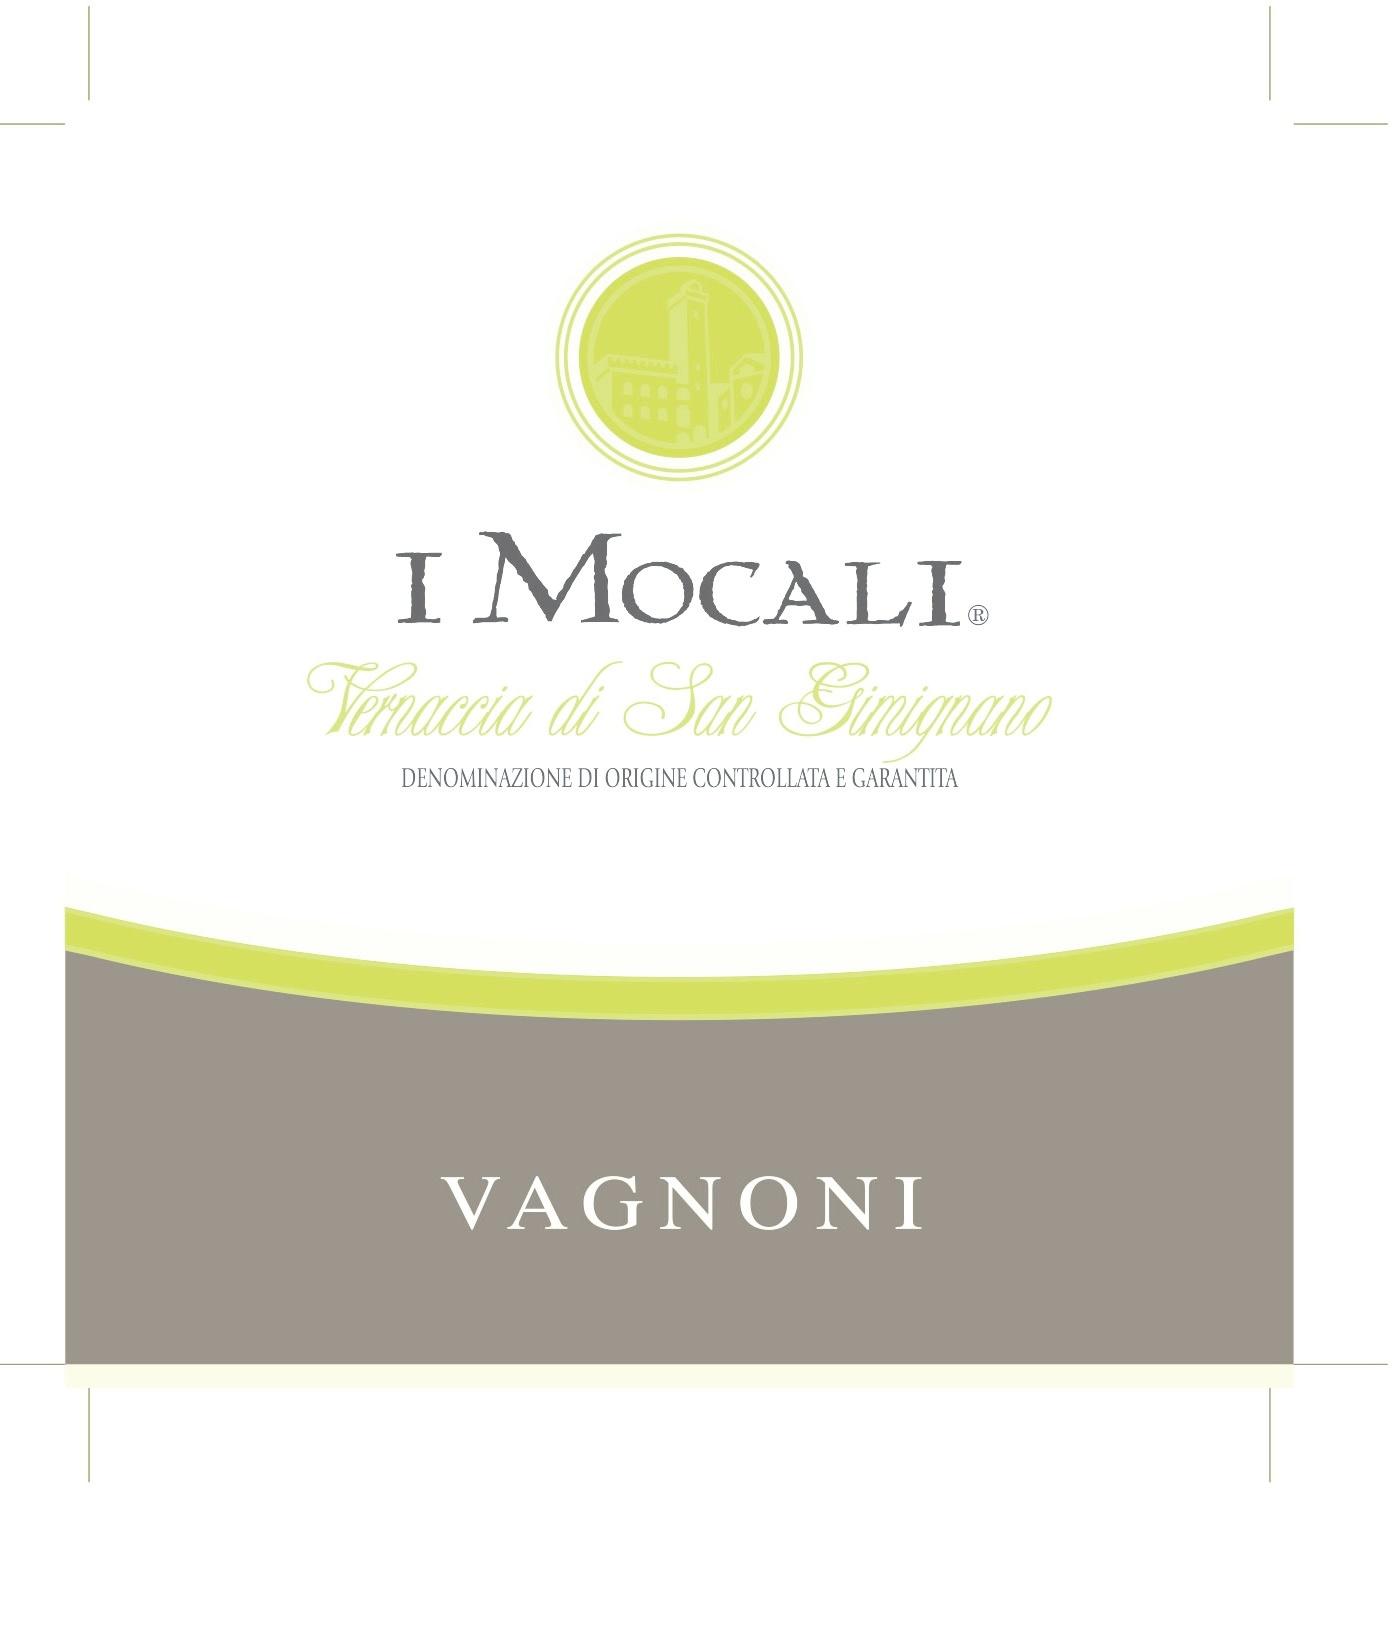 Fratelli Vagnoni, Vernaccia di San Gimignano Riserva I Mocali, 2016